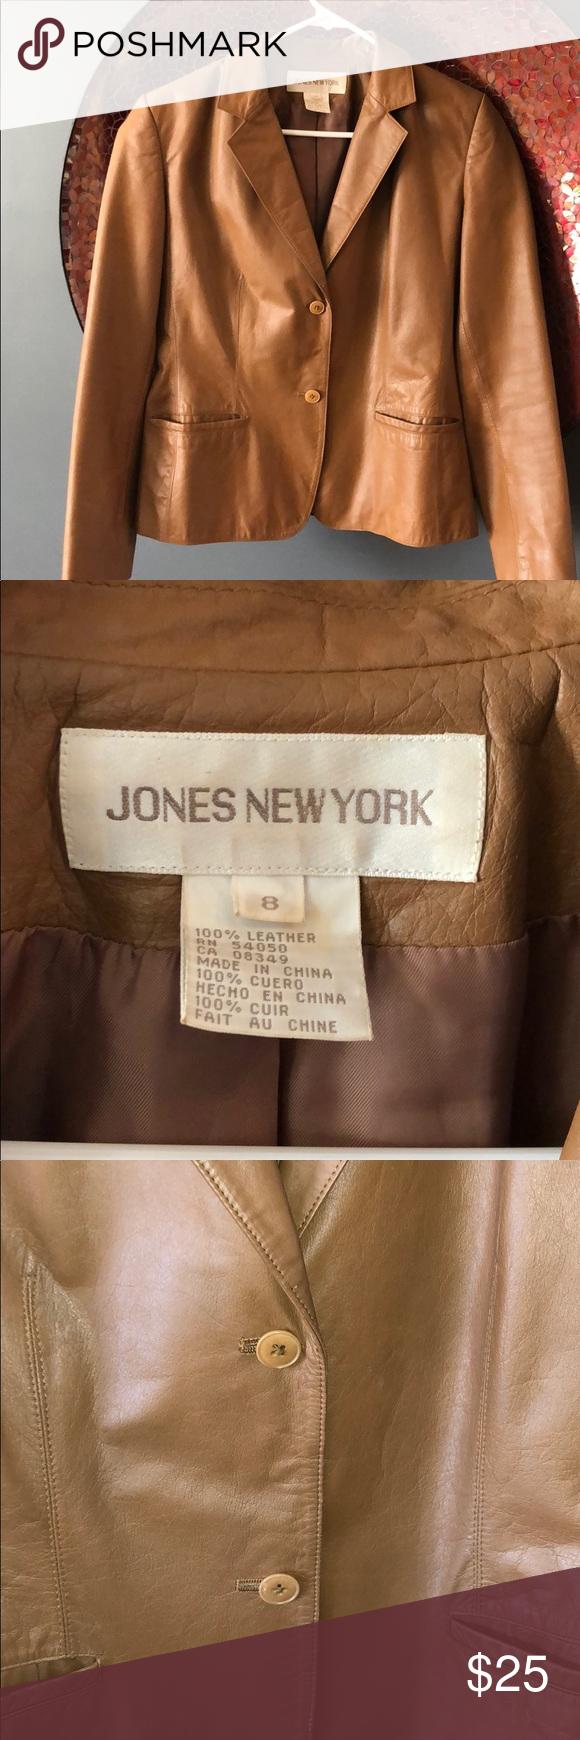 Jones New York Leather Jacket Jones New York Leather Jacket Jackets